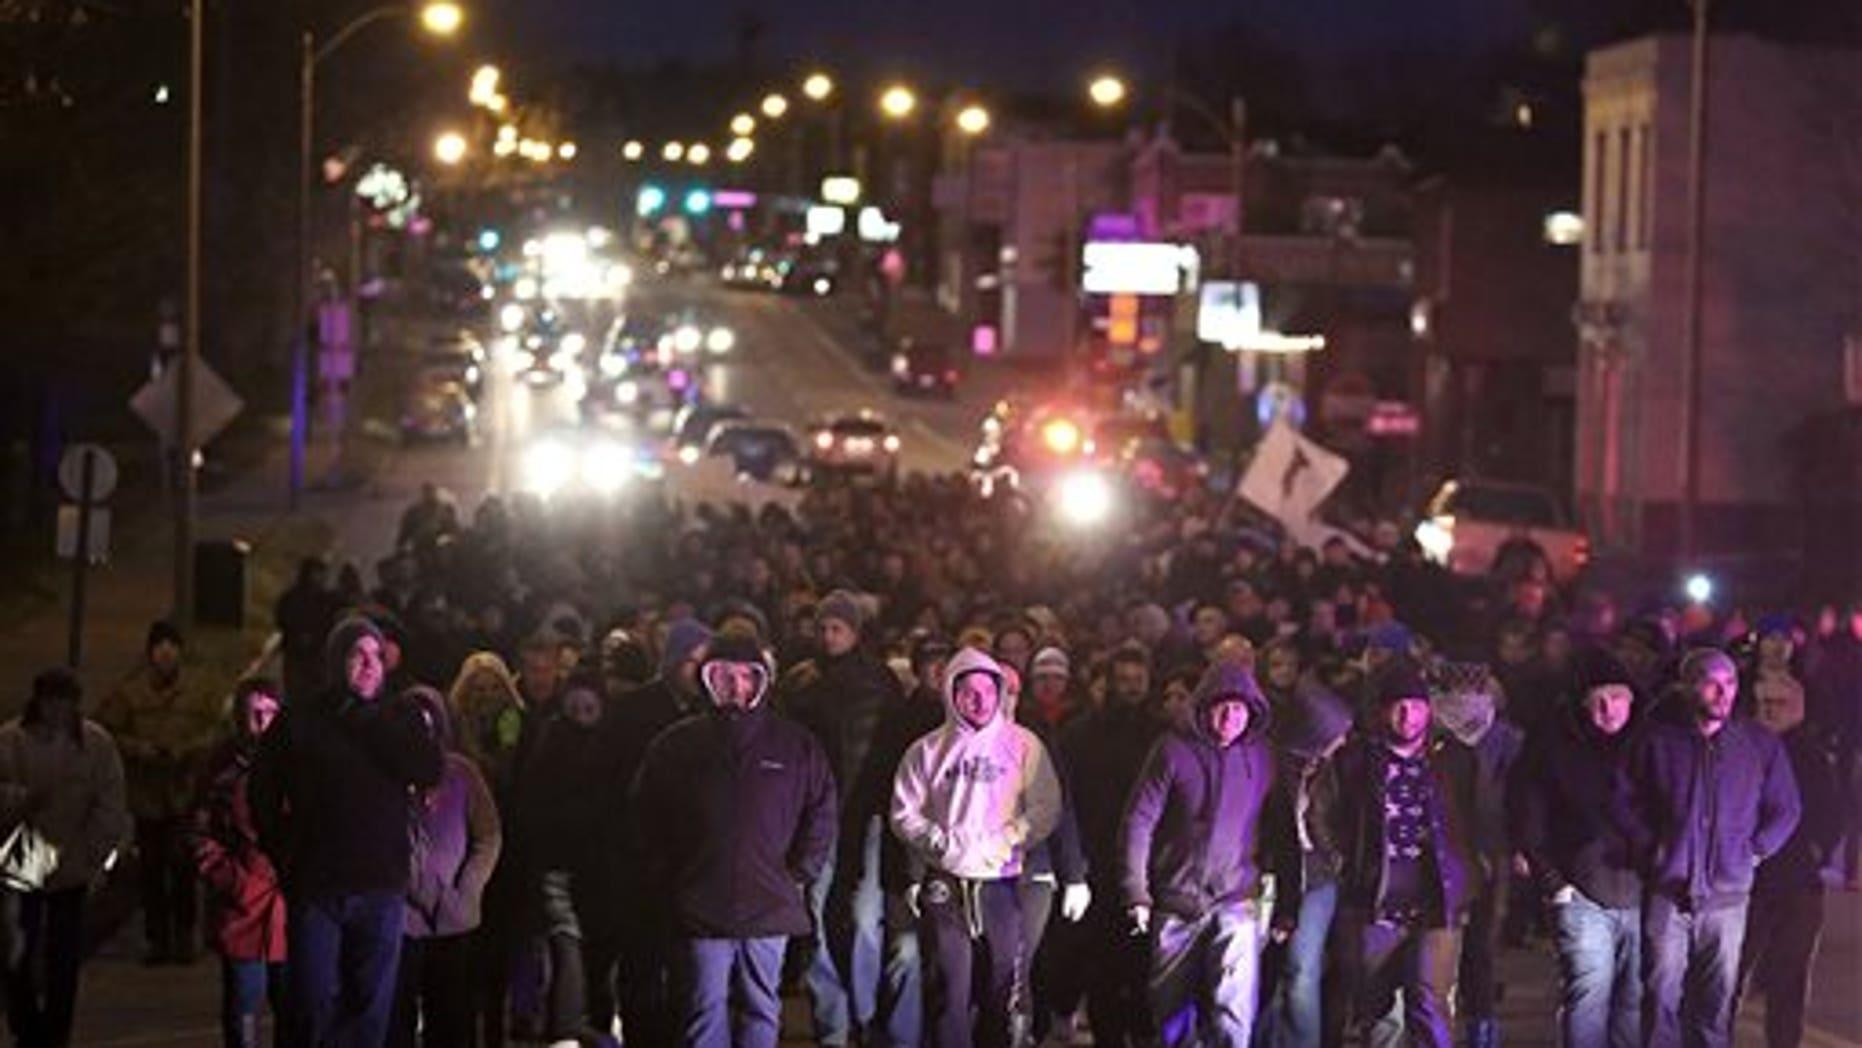 Dec. 1: Bosnians march along Gravois Road to protest the murder of Zemir Begic, a Bosnian man, in St. Louis.